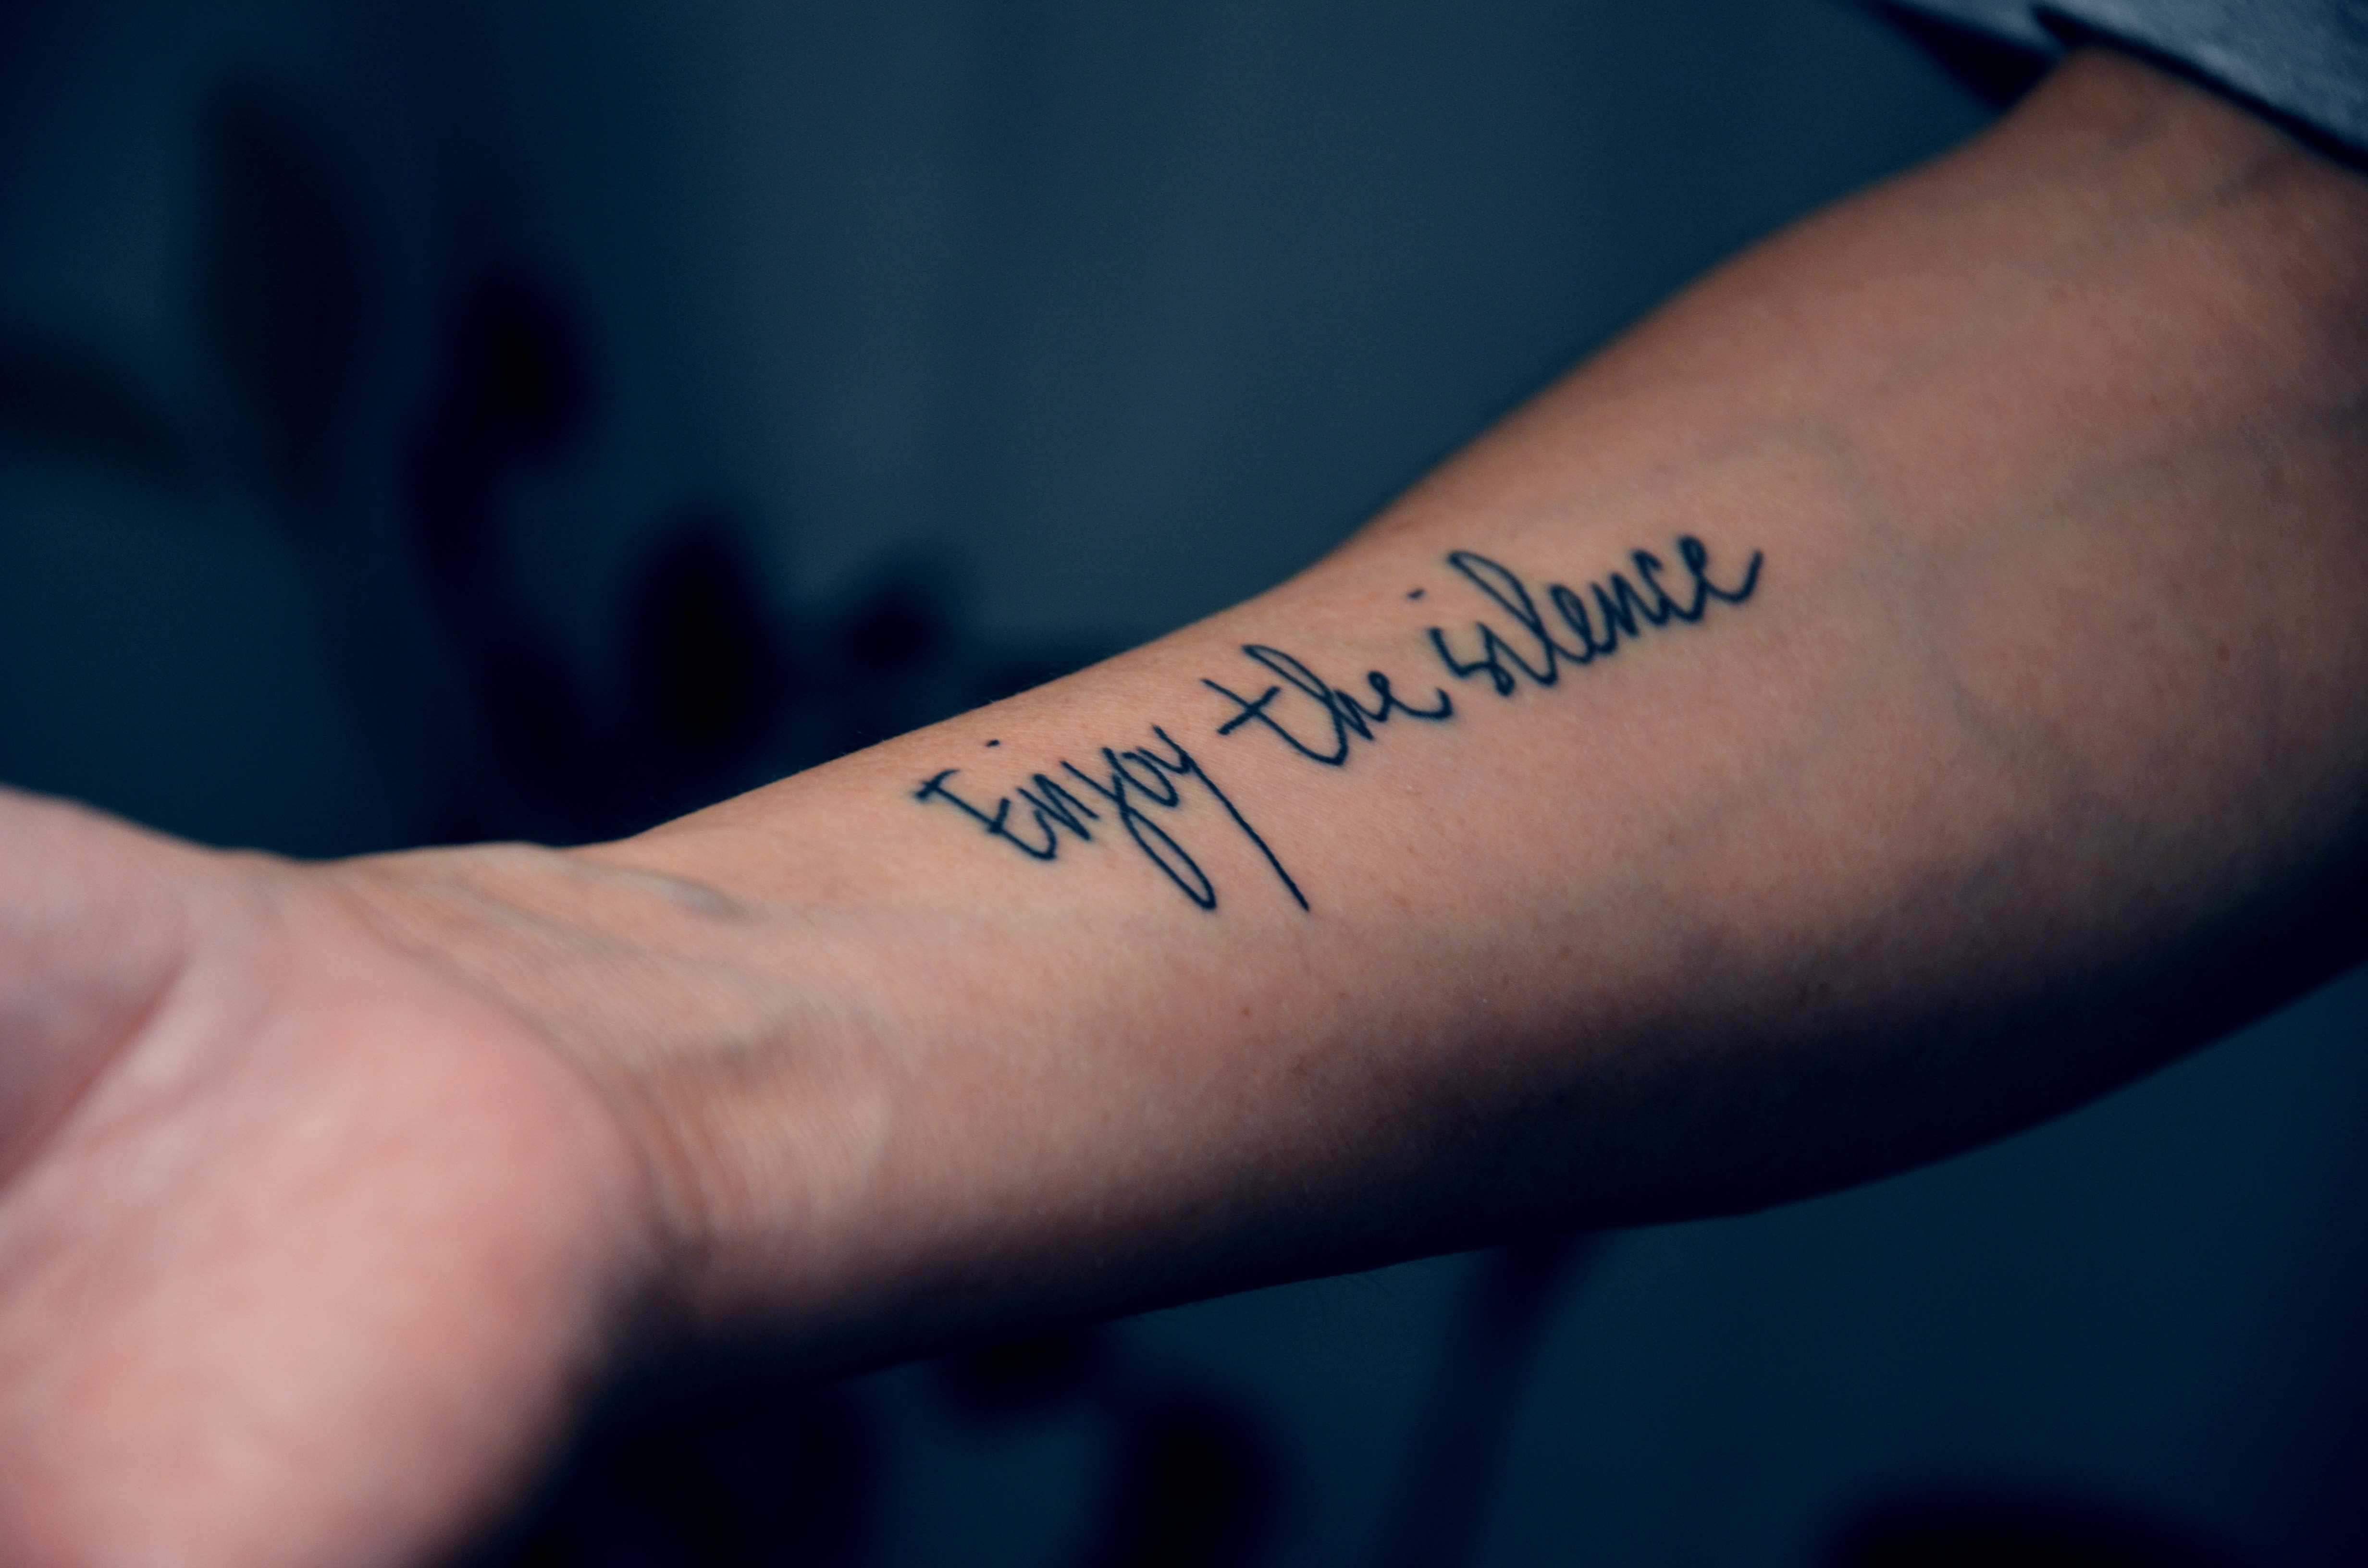 Inner Arm Script Tattoo Designs For Men Man Arm Tattoo Ideas